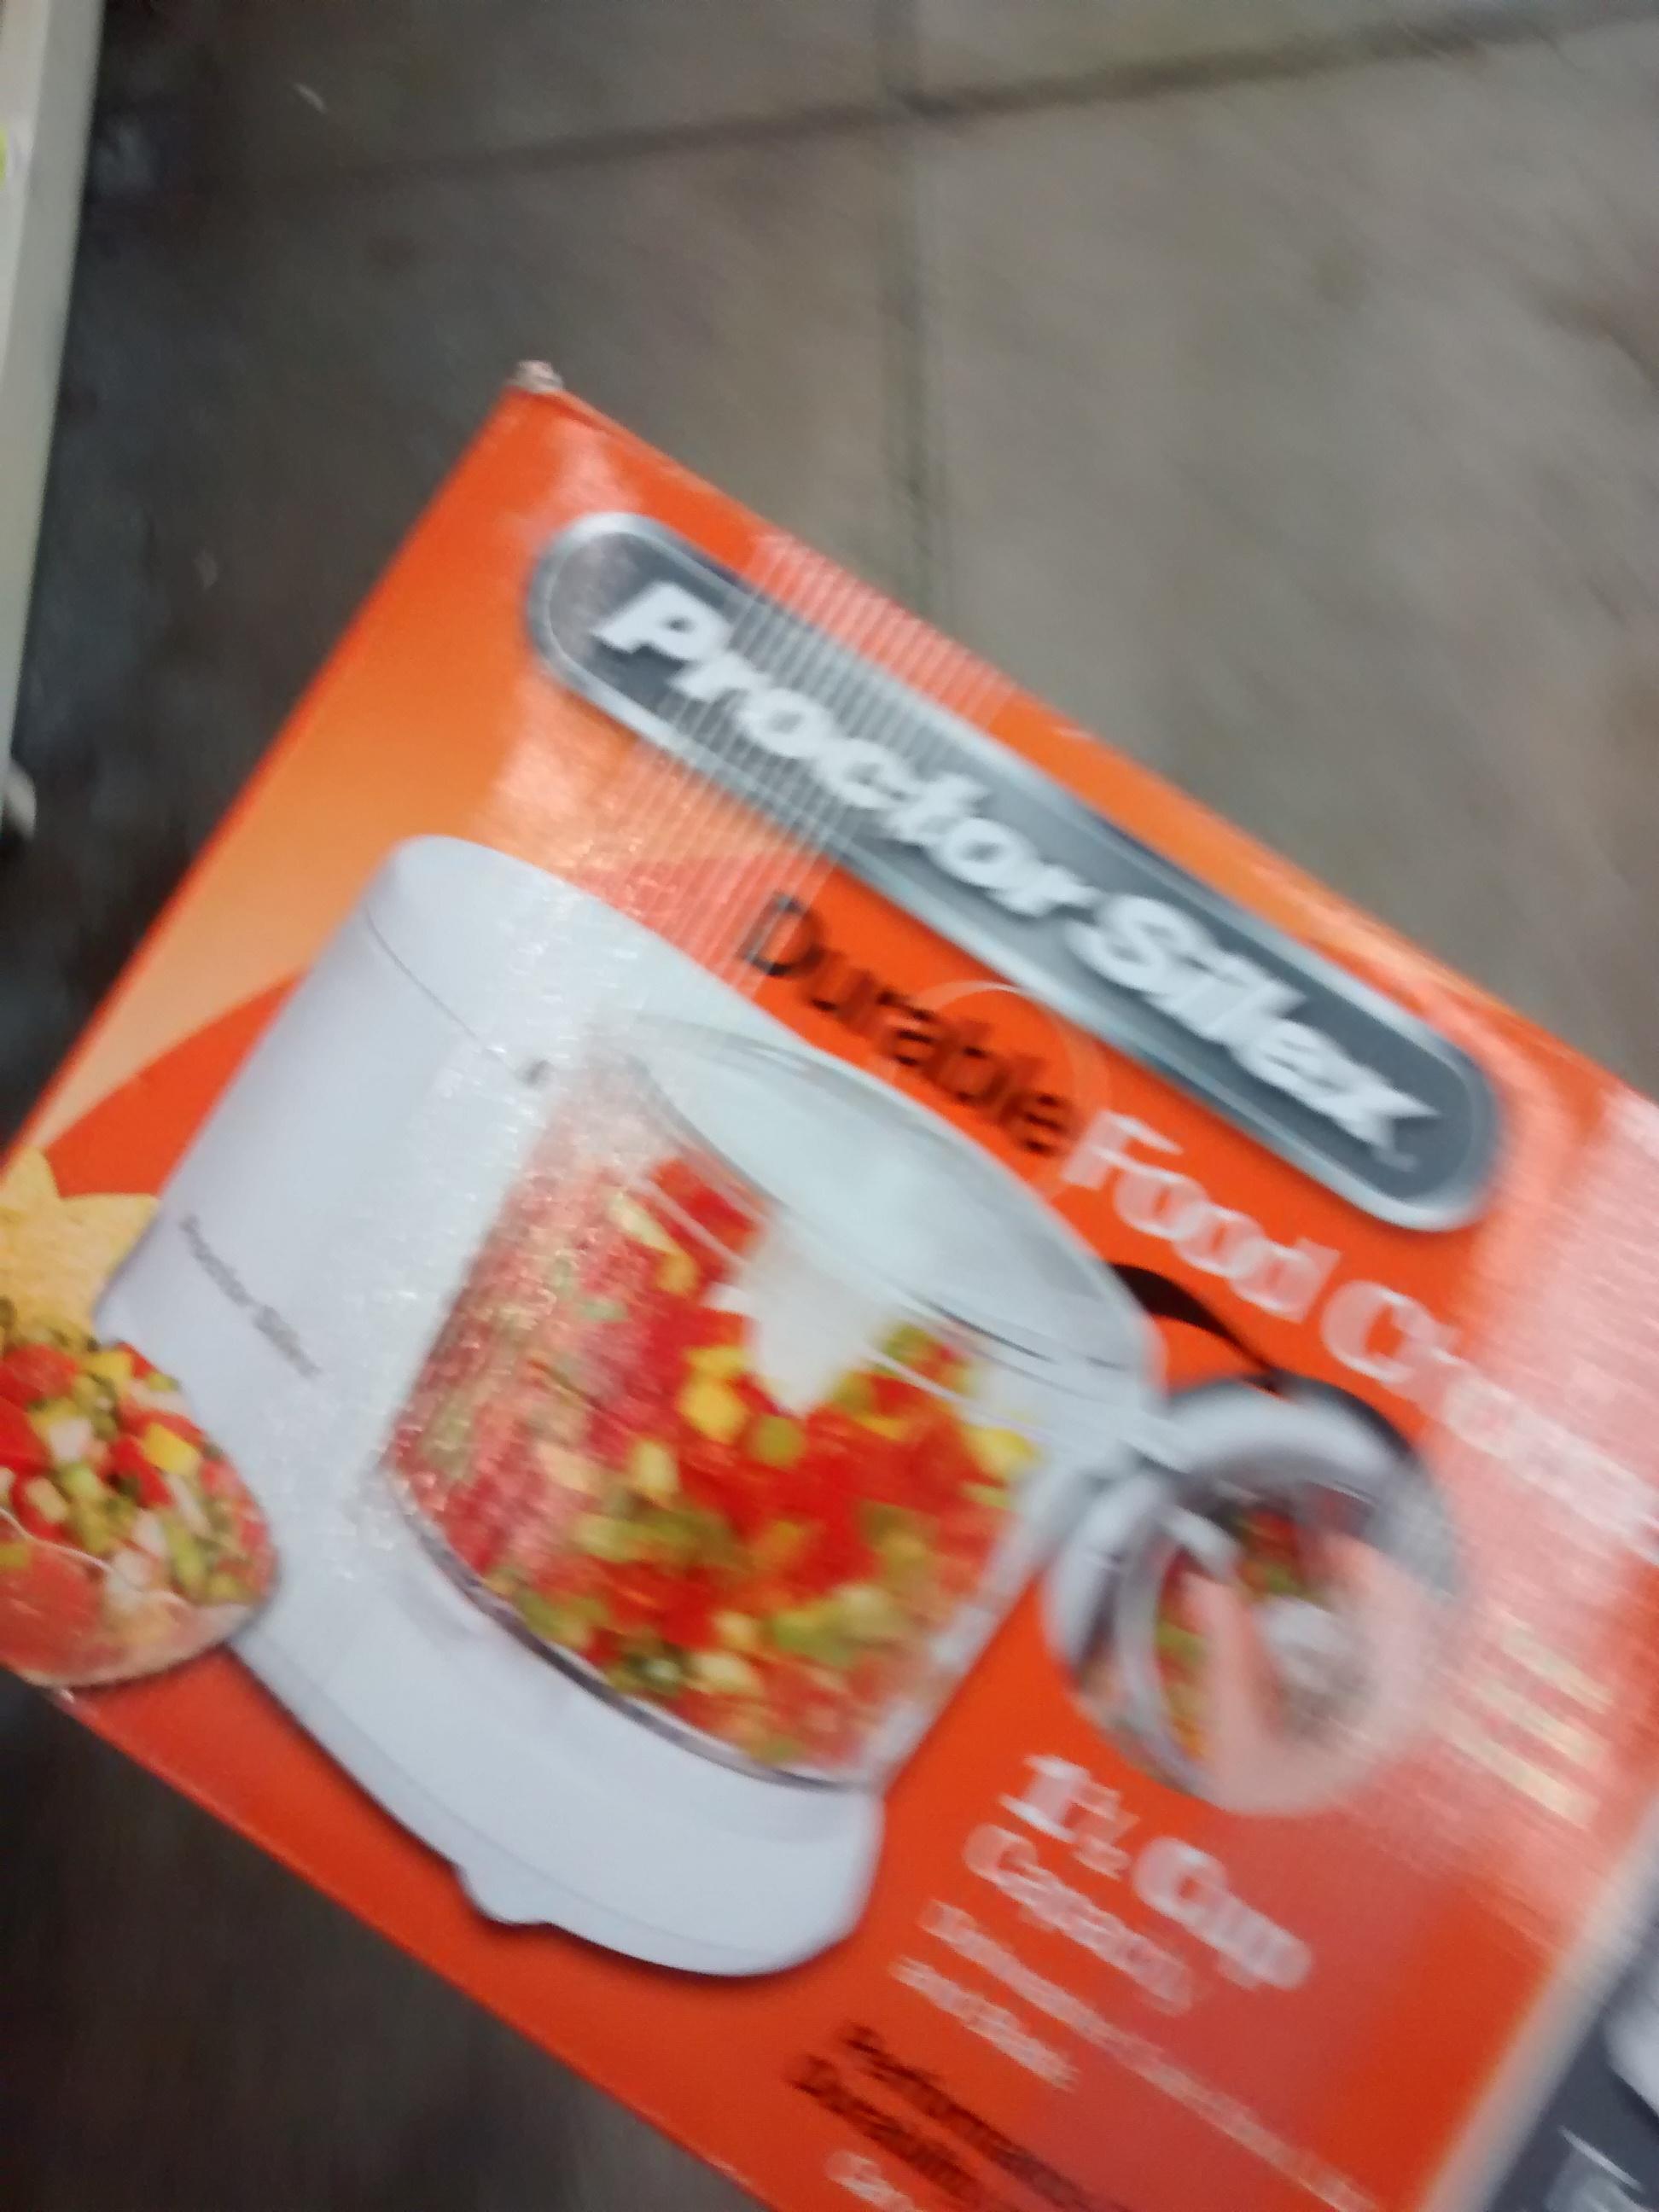 Bodega Aurrerá: Procesador de alimentos a $99.01